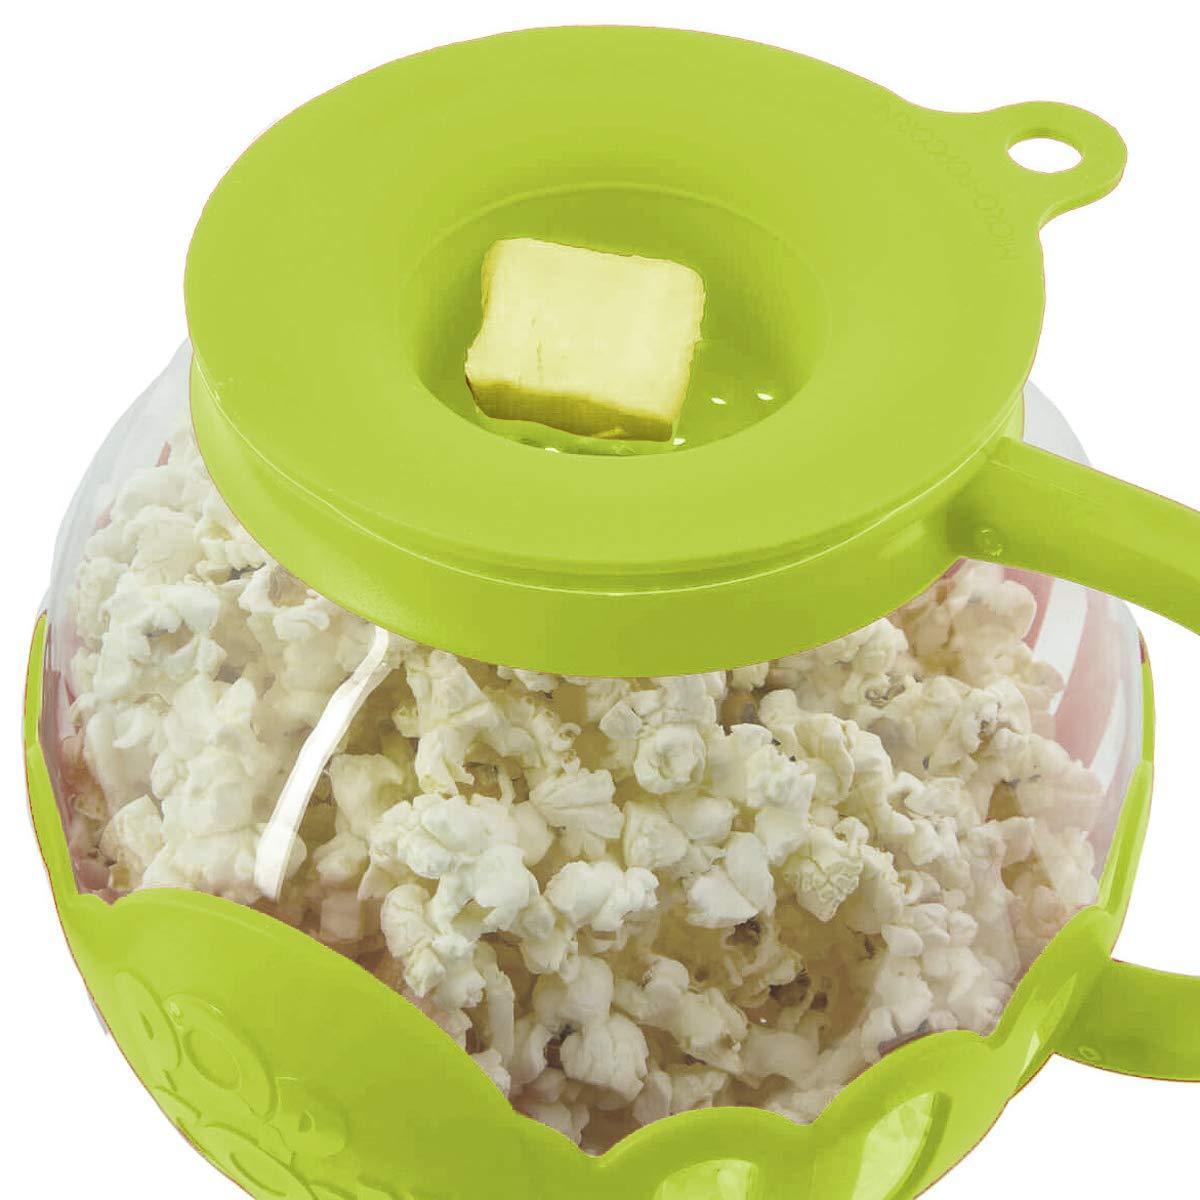 Ecolution 2 Pack Popcorn Maker Glass Microwave Popcorn Popper With Butter Melter For Movie Style Popcorn